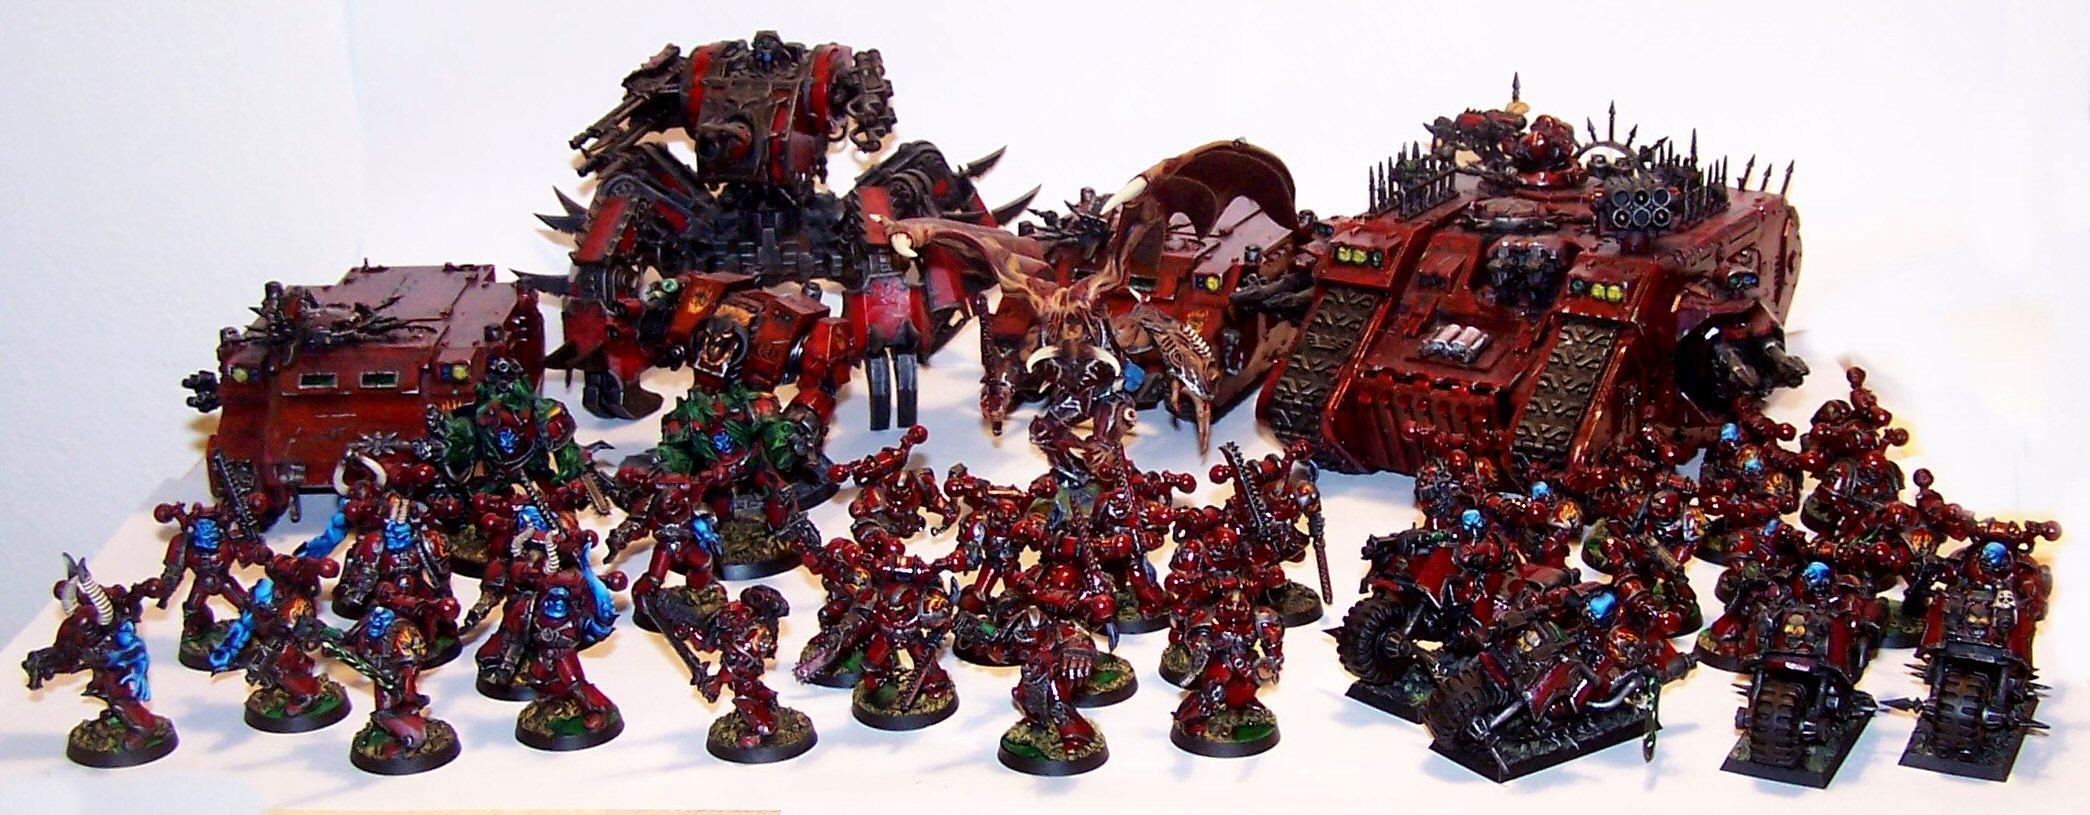 Chaos Space Marines, Warhammer 40,000, Word Bearers